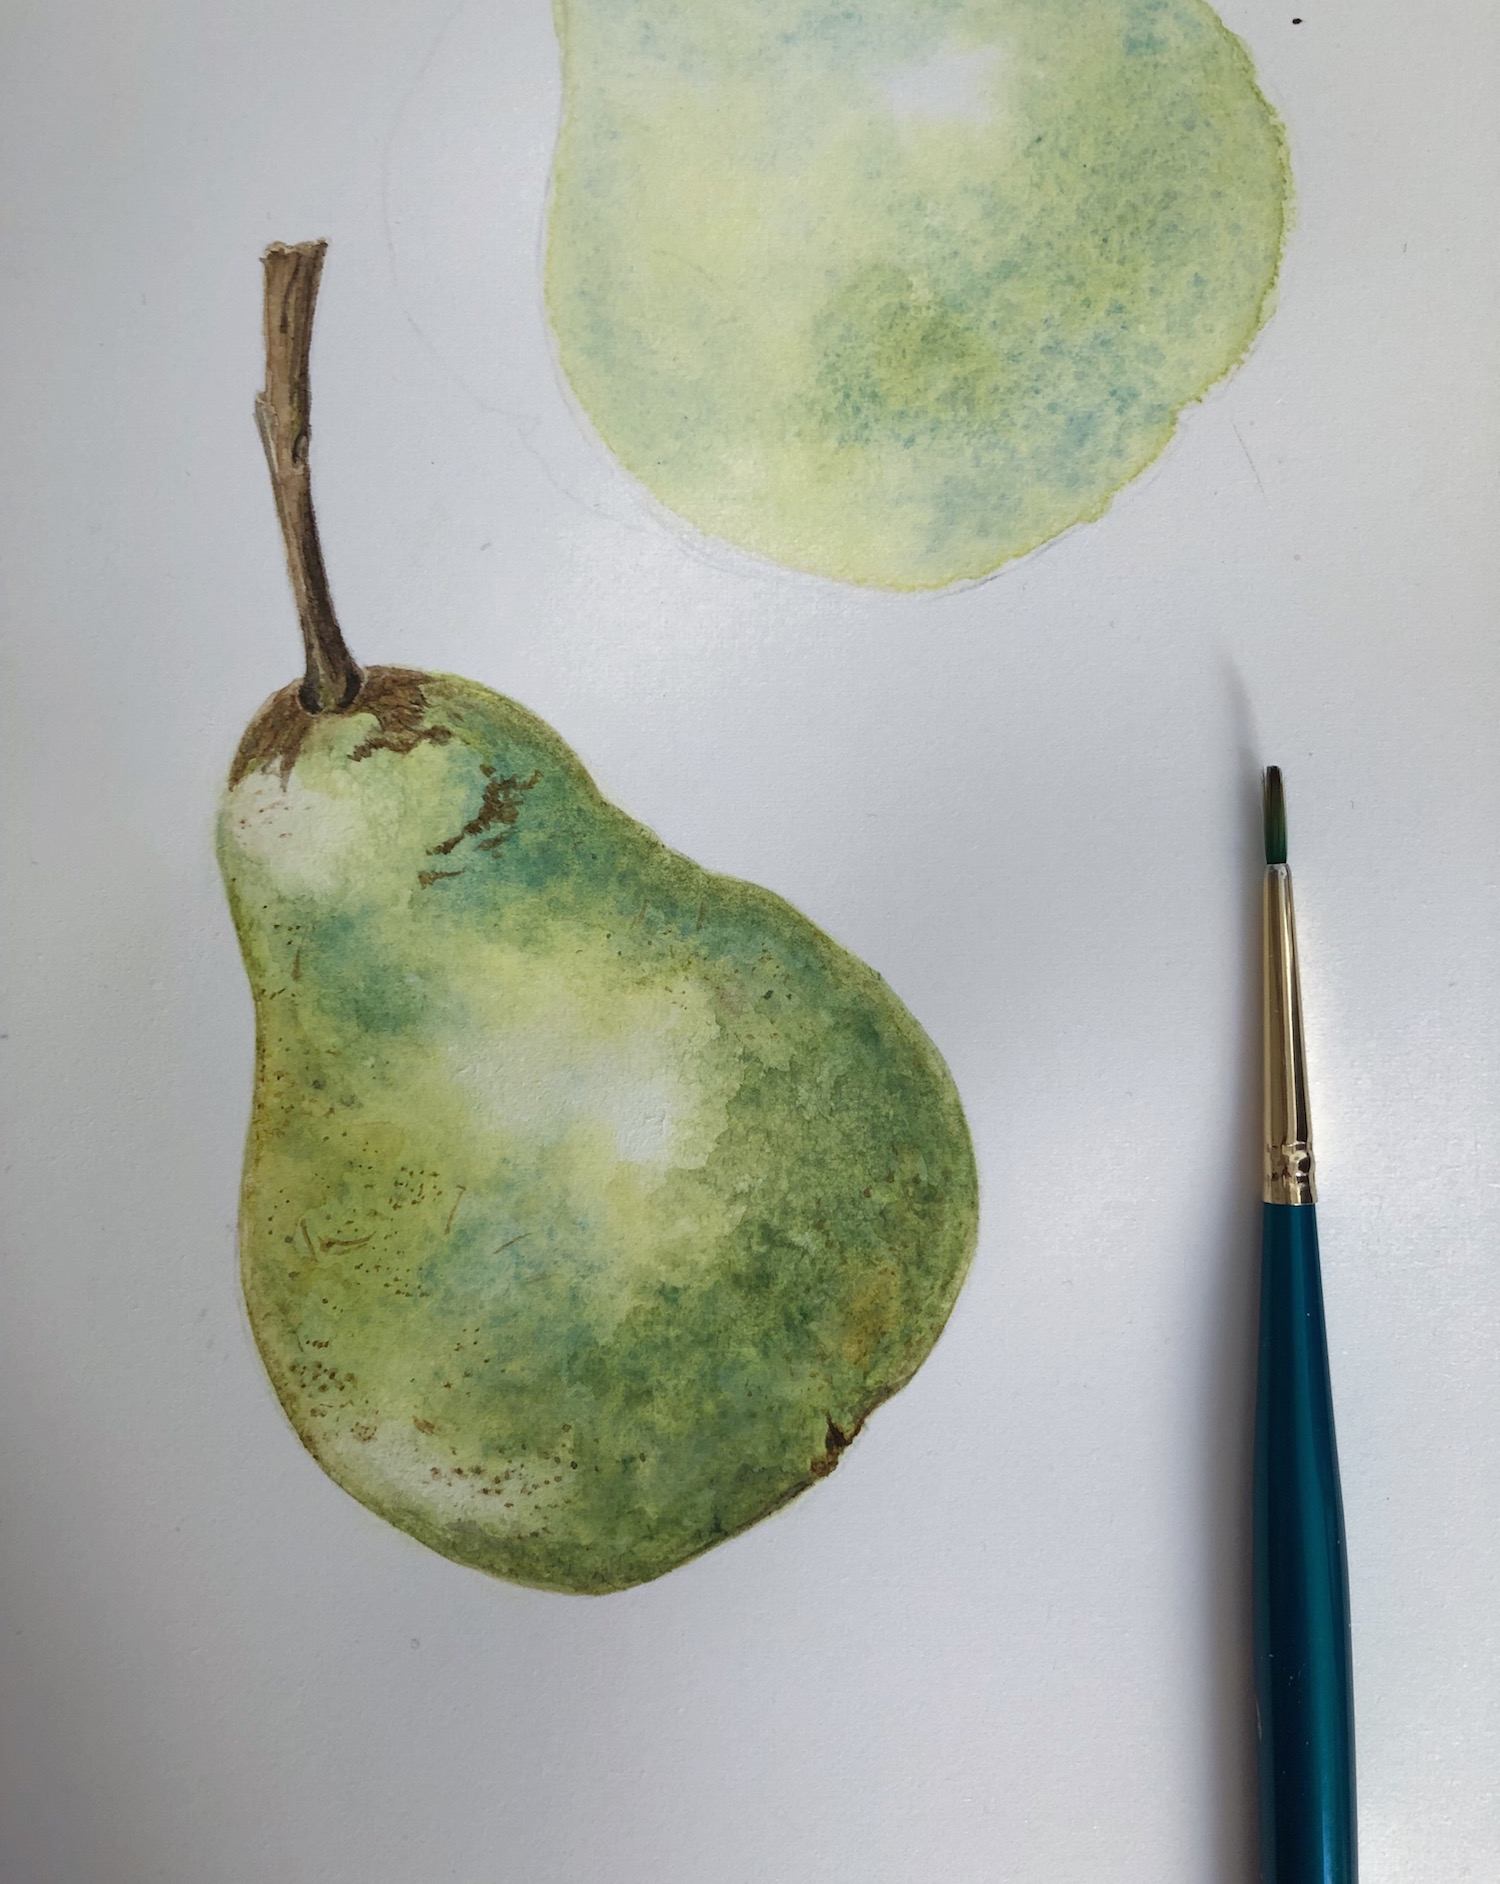 harvest-pear.JPG